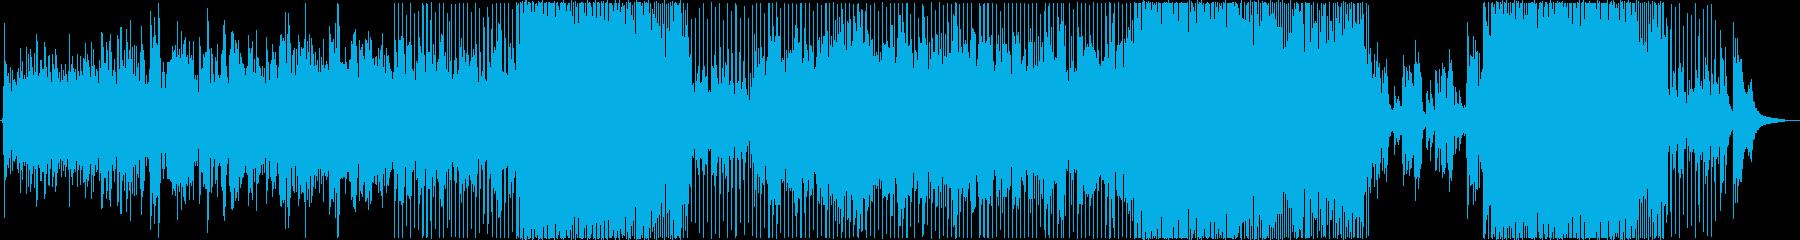 Singing Lifeの再生済みの波形